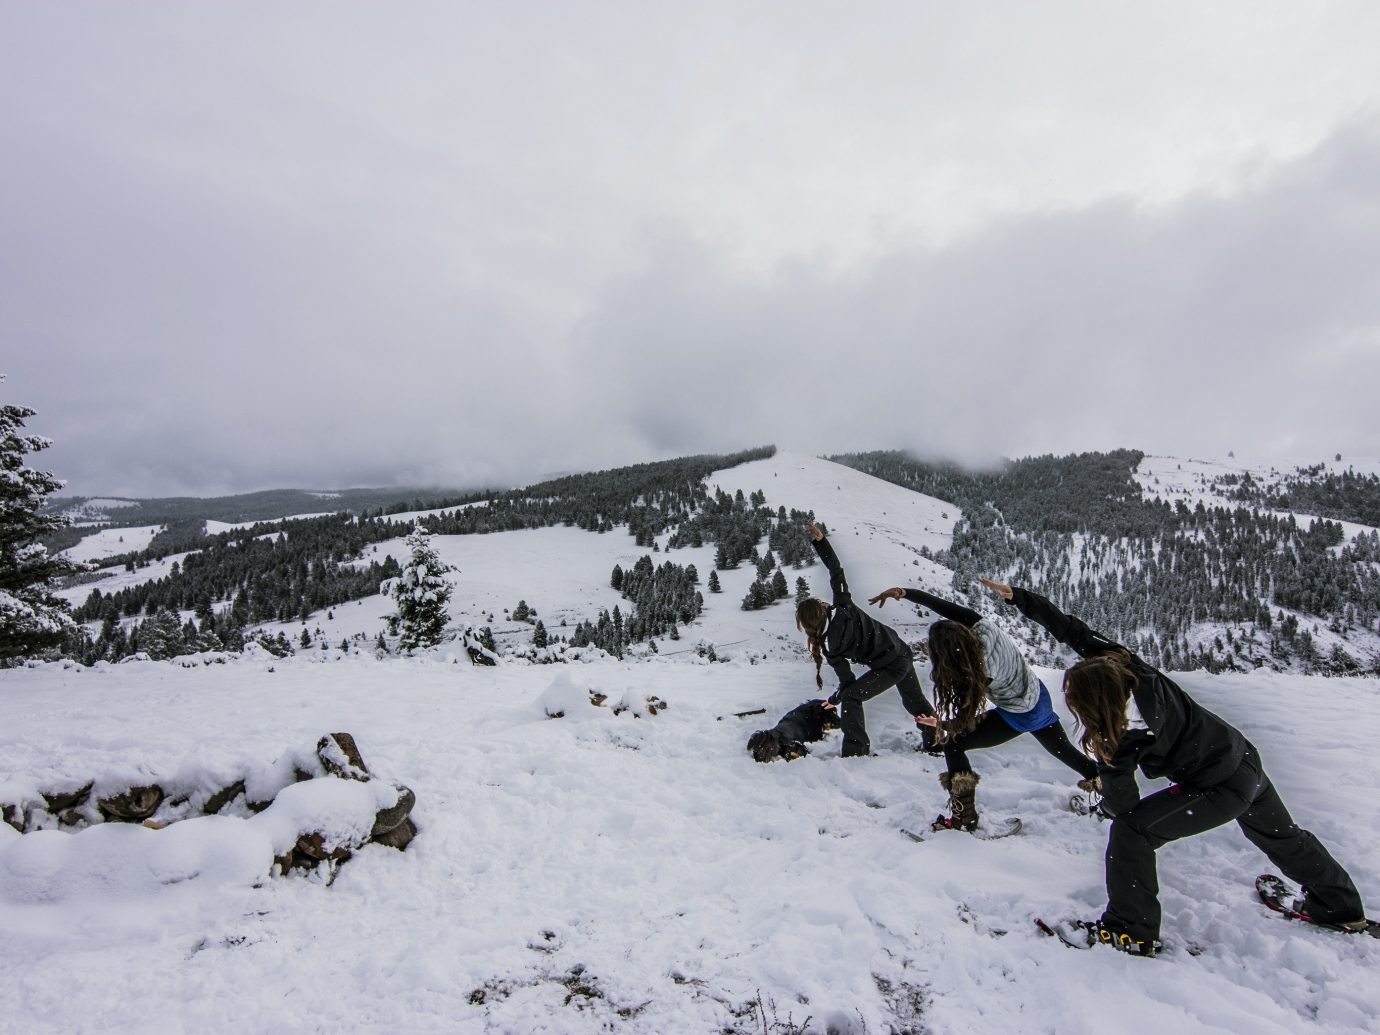 Health + Wellness Spa Retreats Trip Ideas snow outdoor sky Winter weather footwear geological phenomenon Nature season mountain skiing snowshoe hill winter sport slope ski slope day